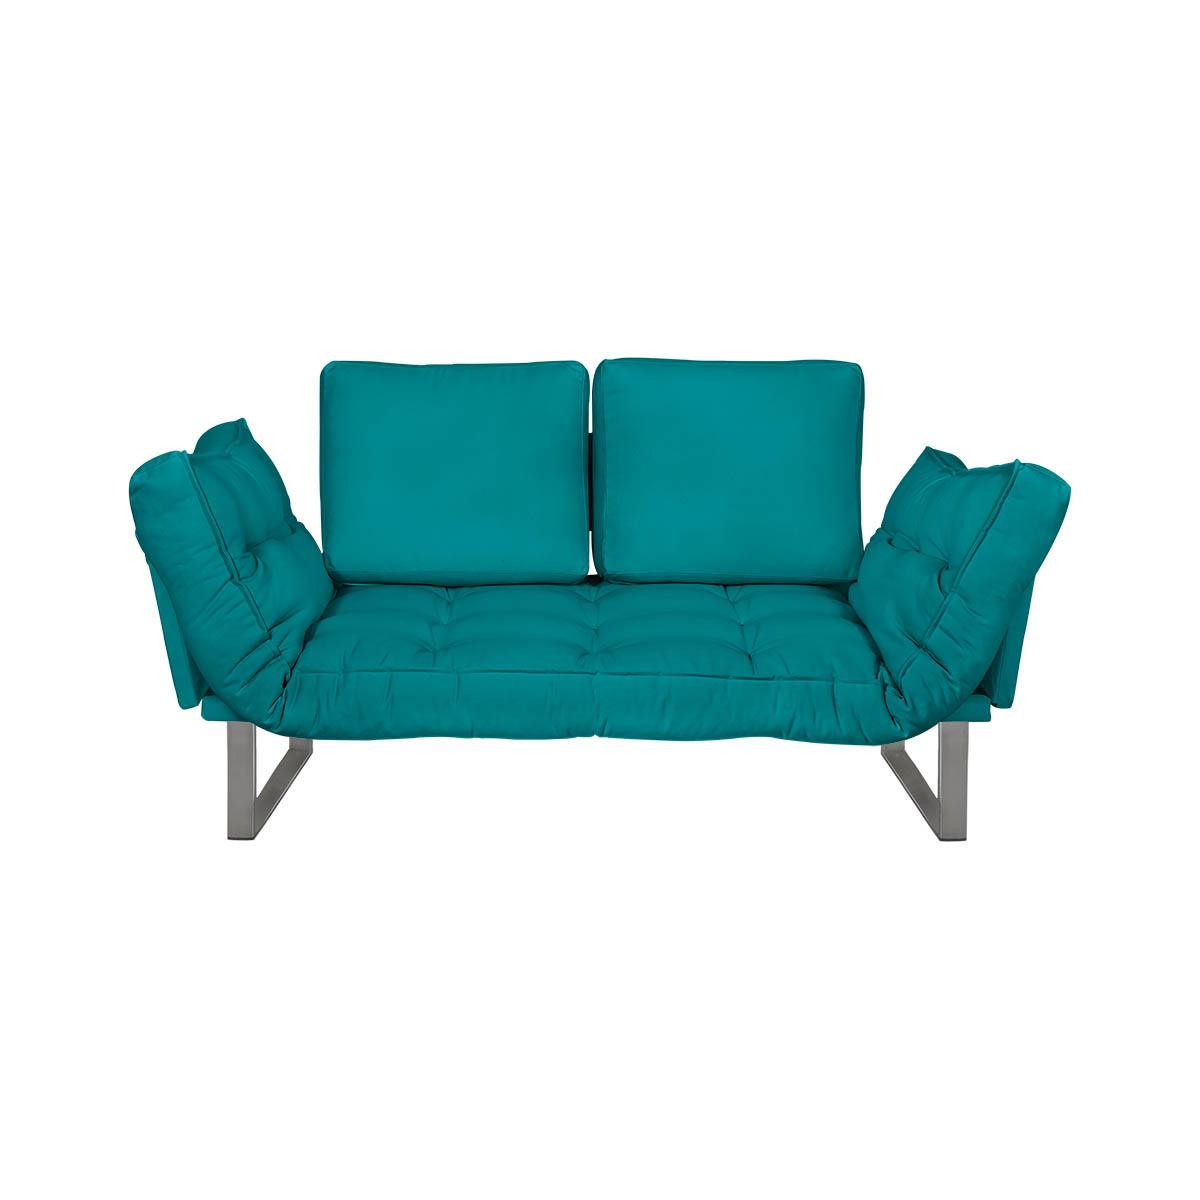 Sofa Cama Solteiro • Futon Company - photo#5